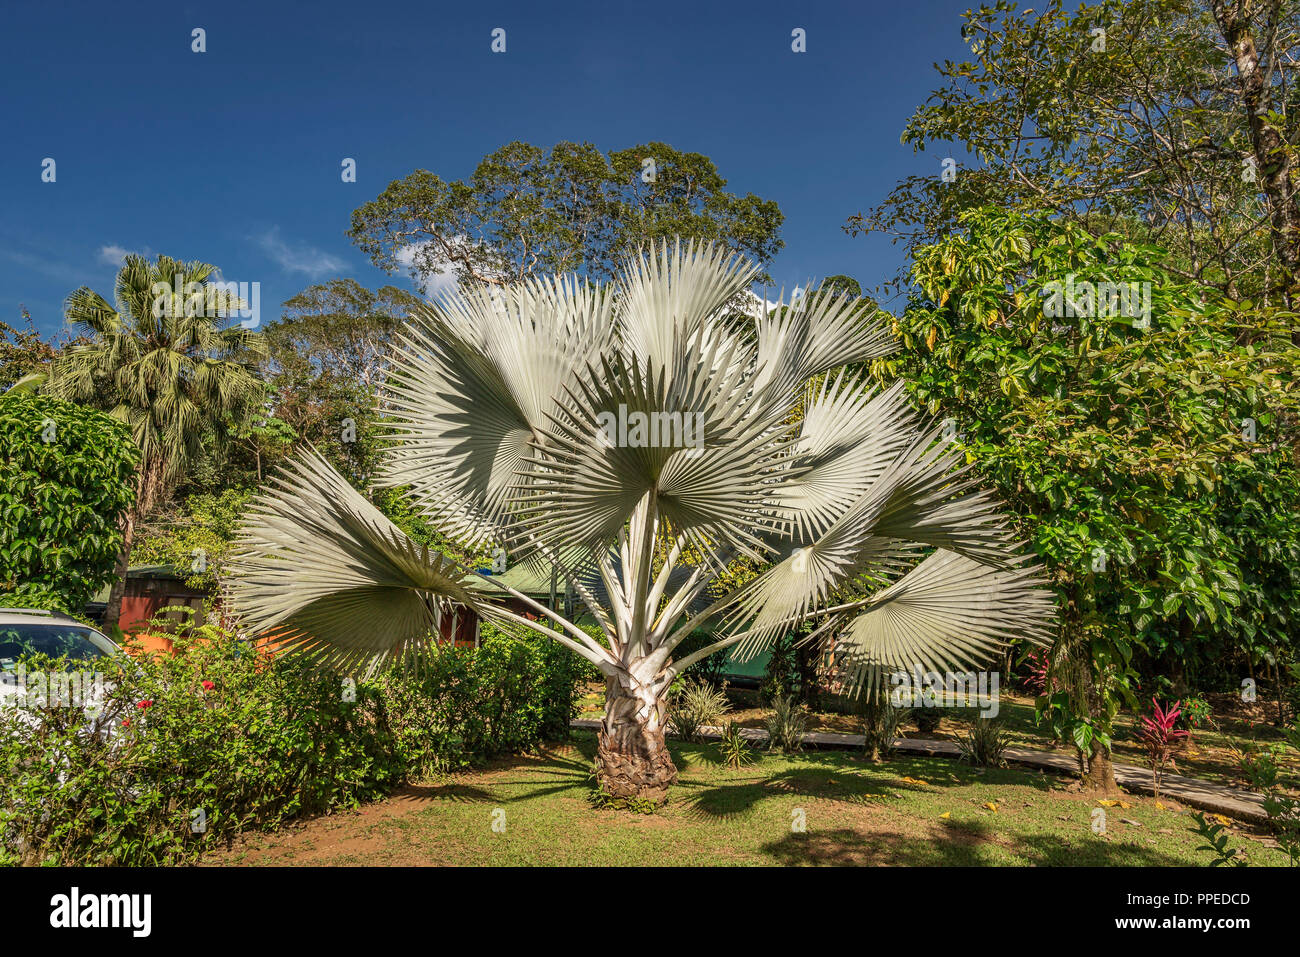 Palm Trees, Costa Rica - Stock Image